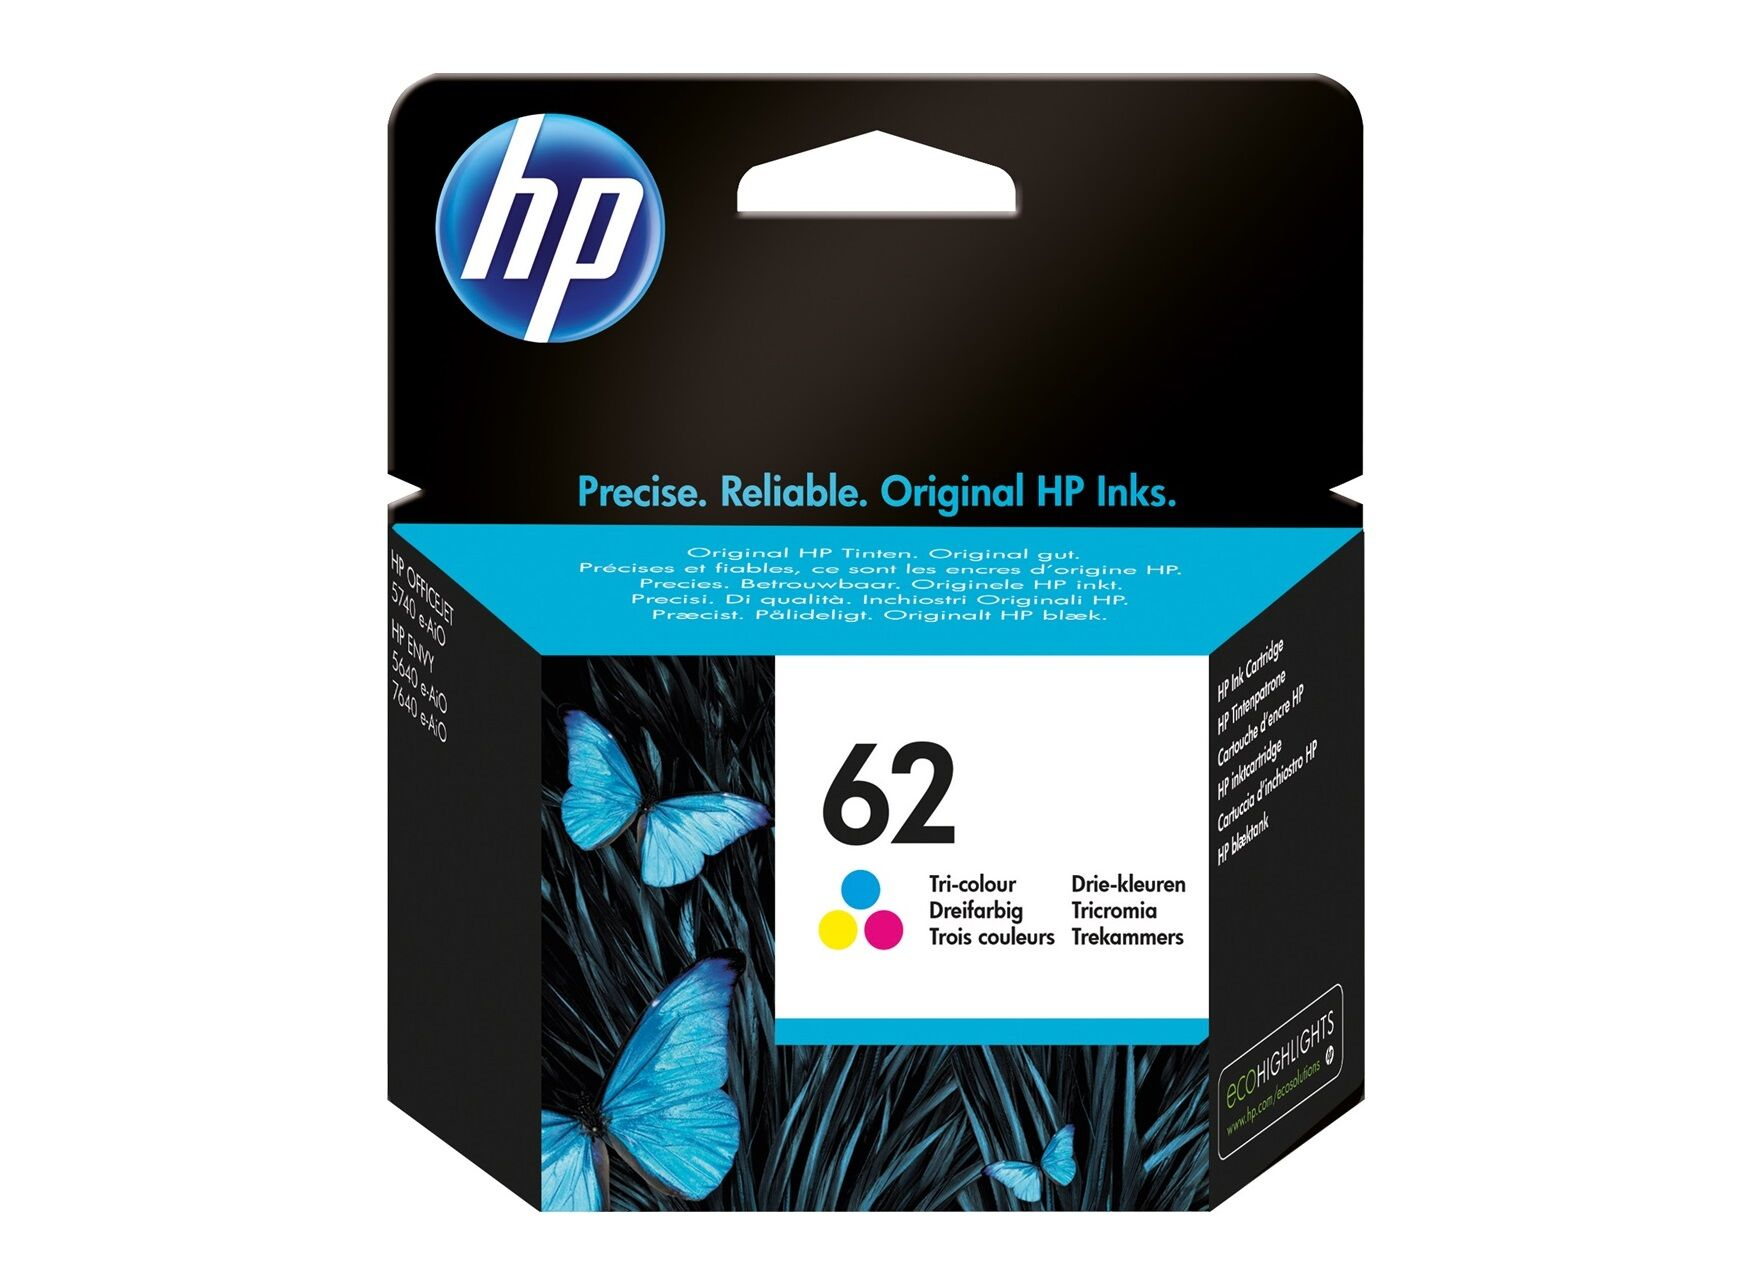 HP 62 - cyan, magenta, jaune - cartouche d'encre originale